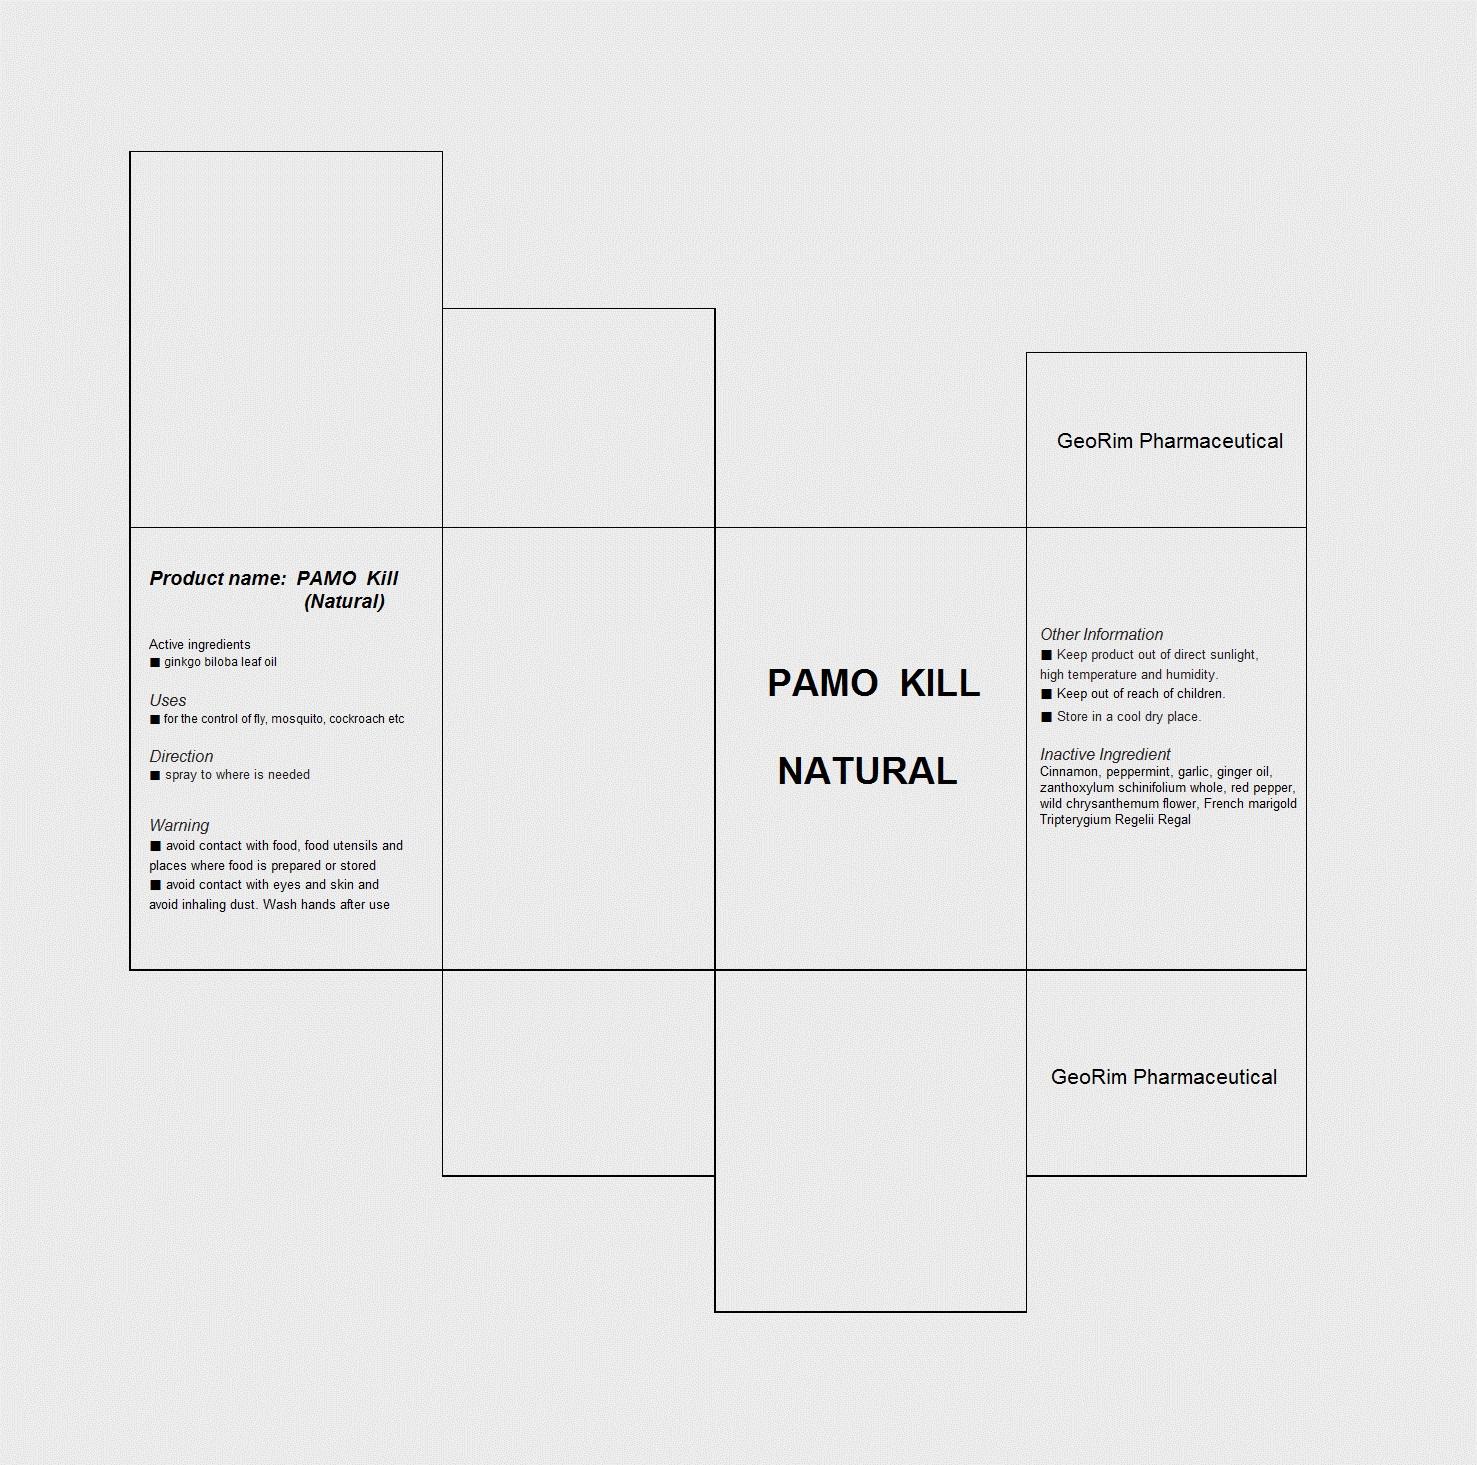 Pamo Kill Natural (Ginkgo Biloba Leaf Oil) Liquid [Georim Pharmaceutical]